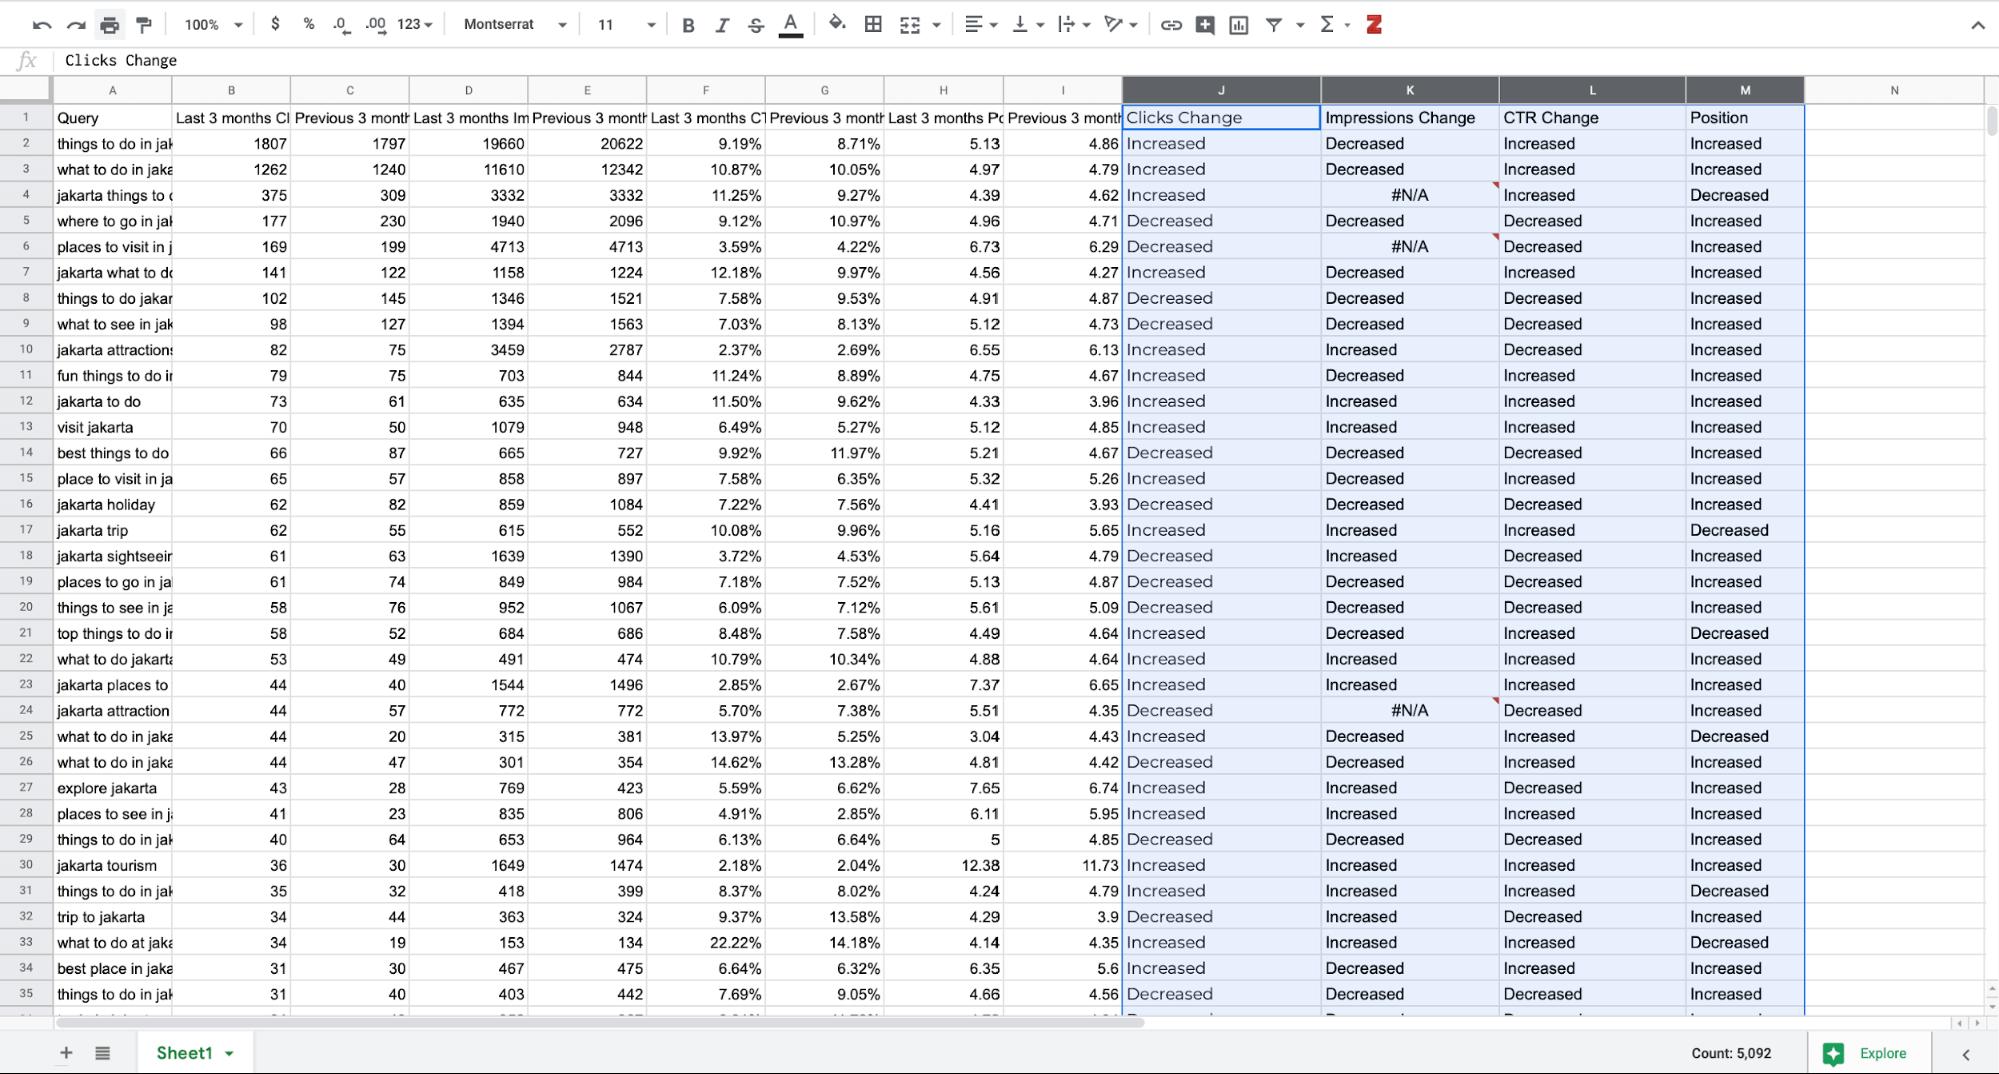 Comparing keyword clicks